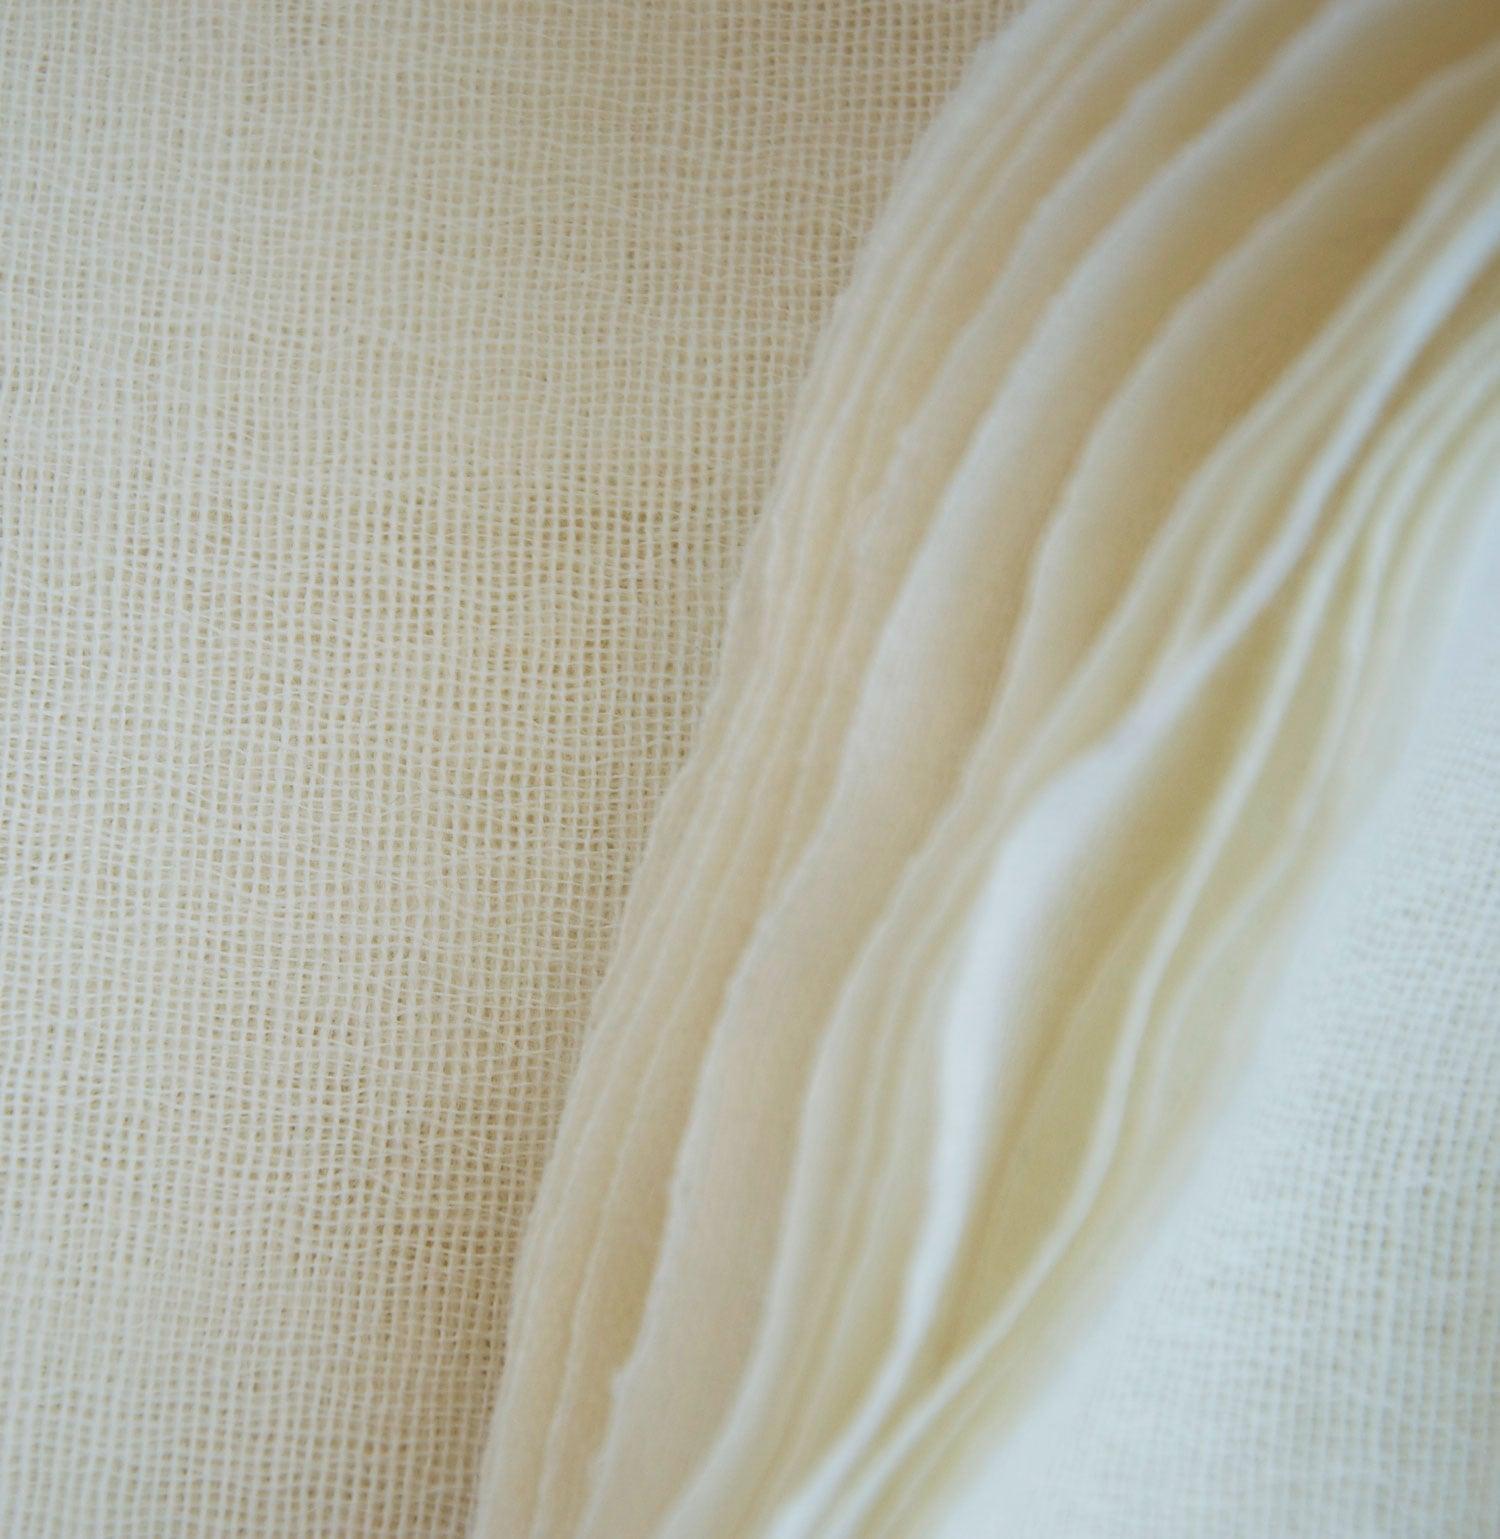 Detail_Gauze_Scarf_folded_2.jpg